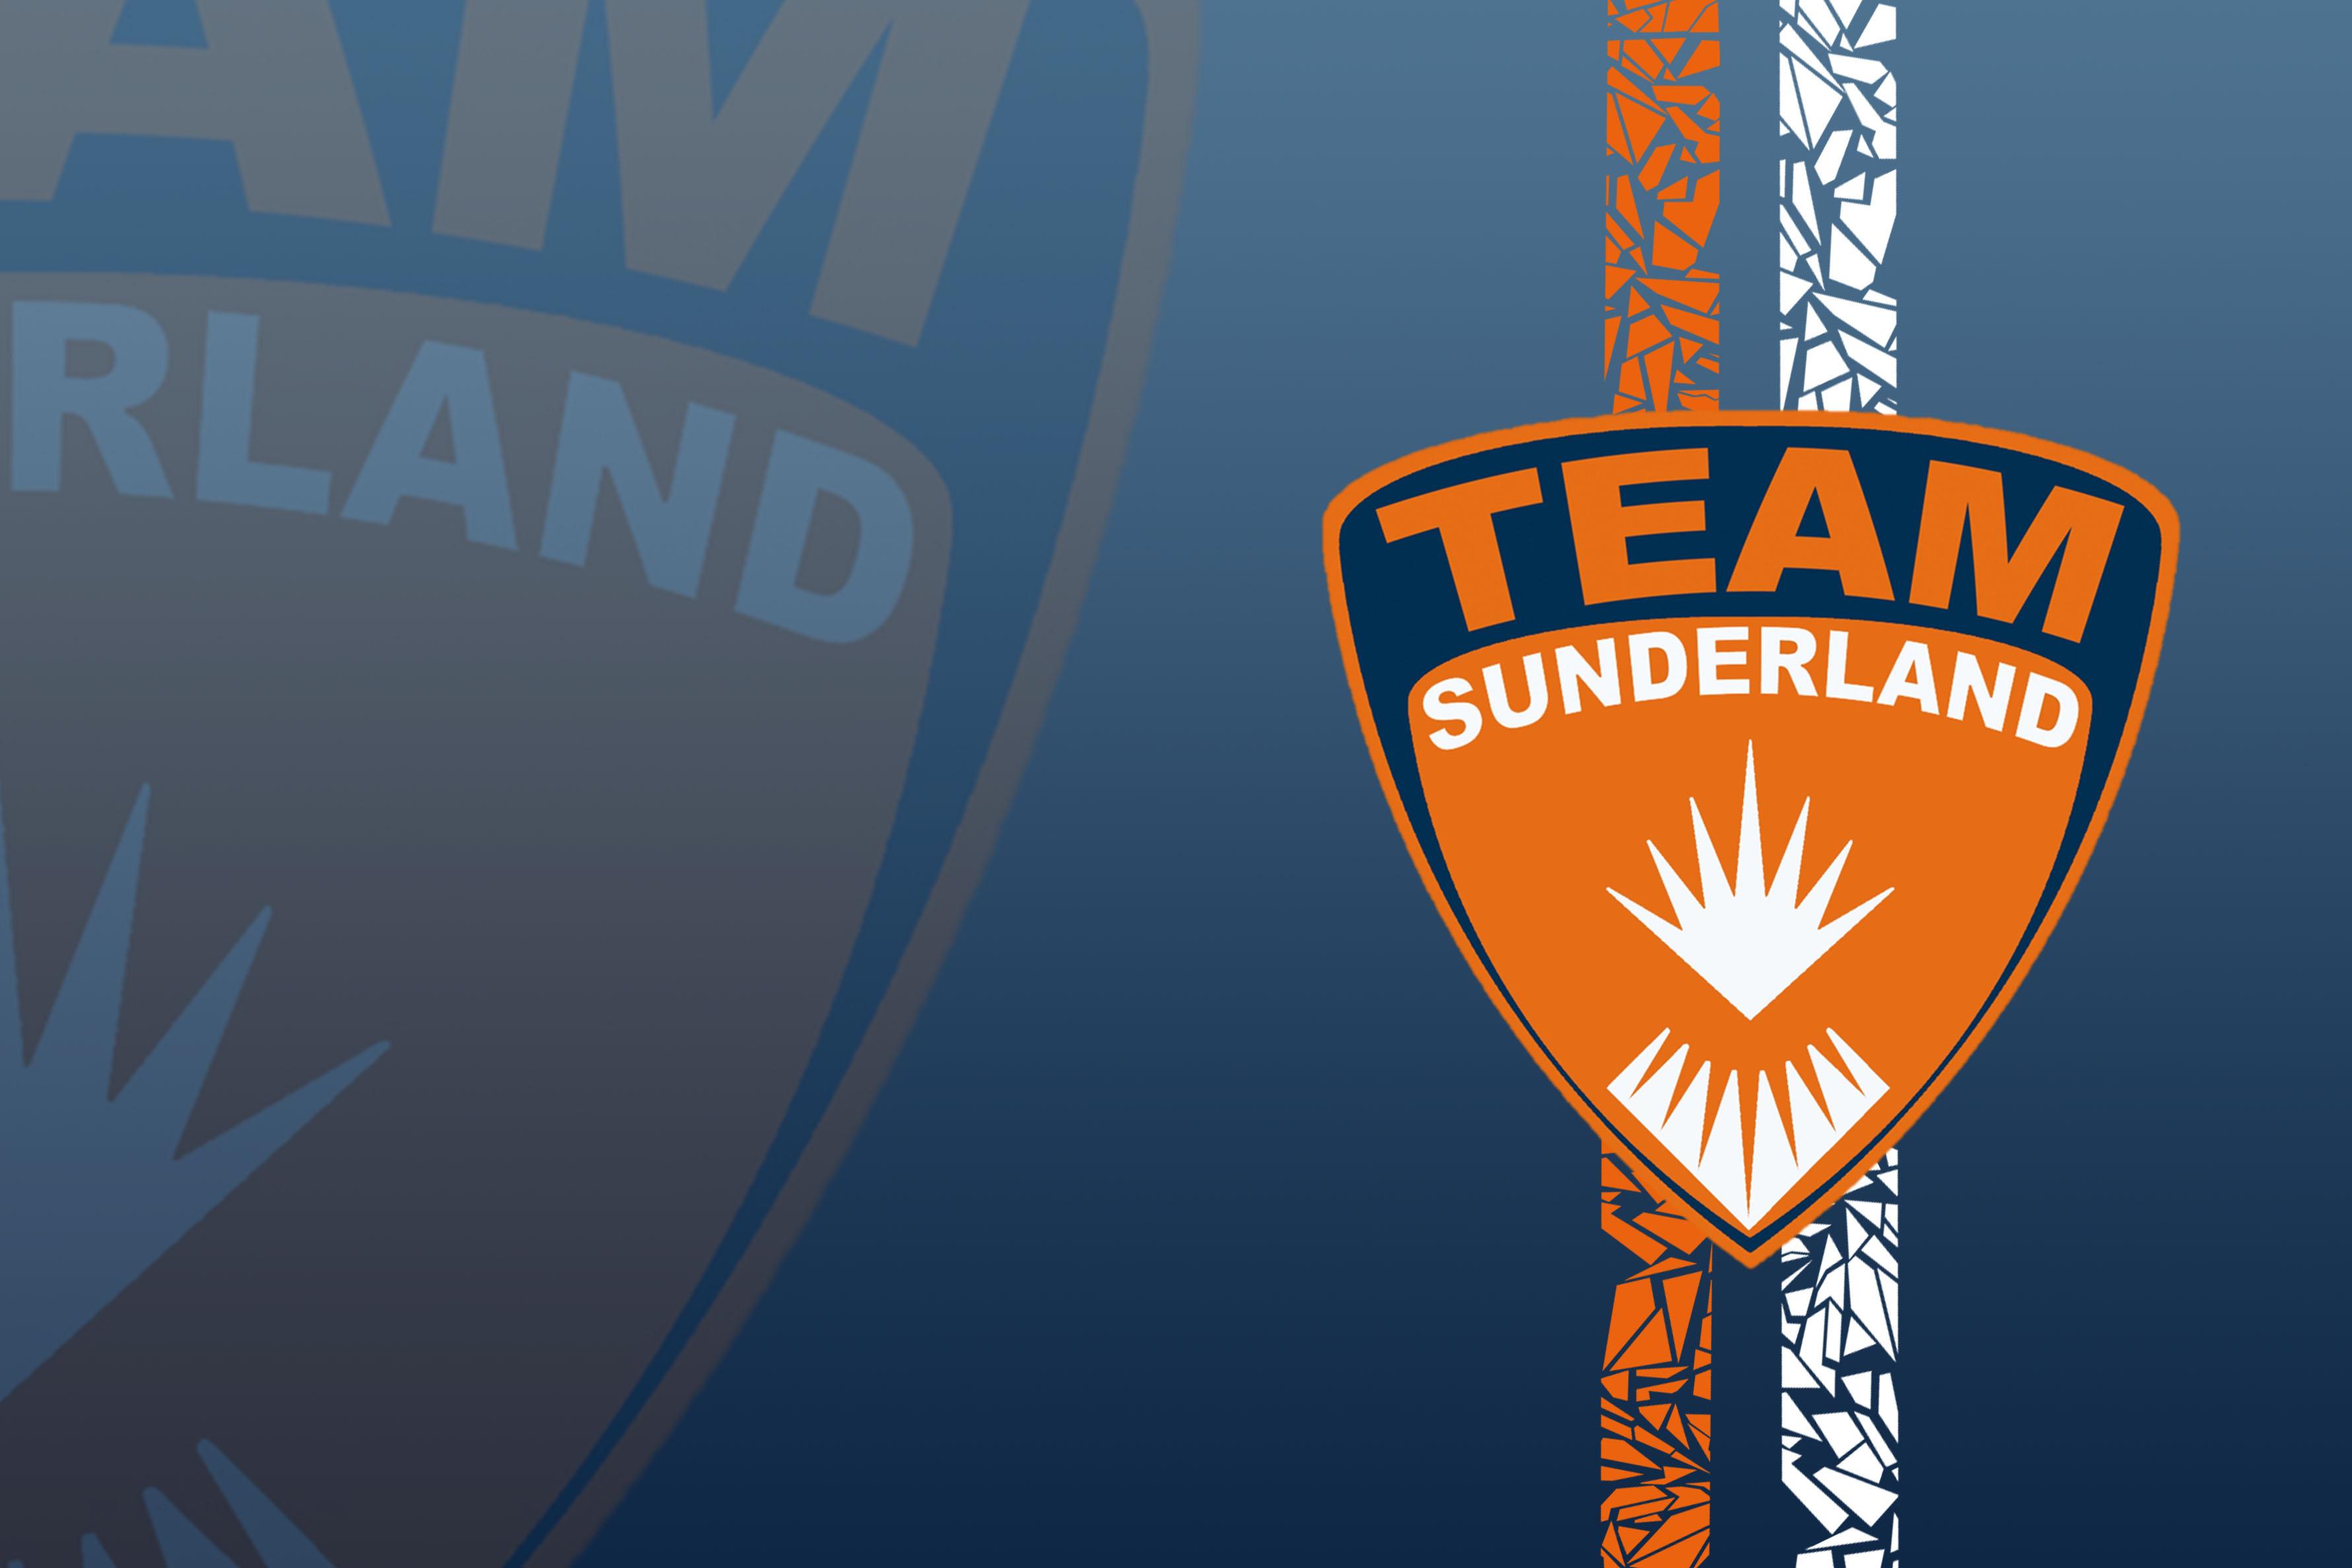 Team Sunderland